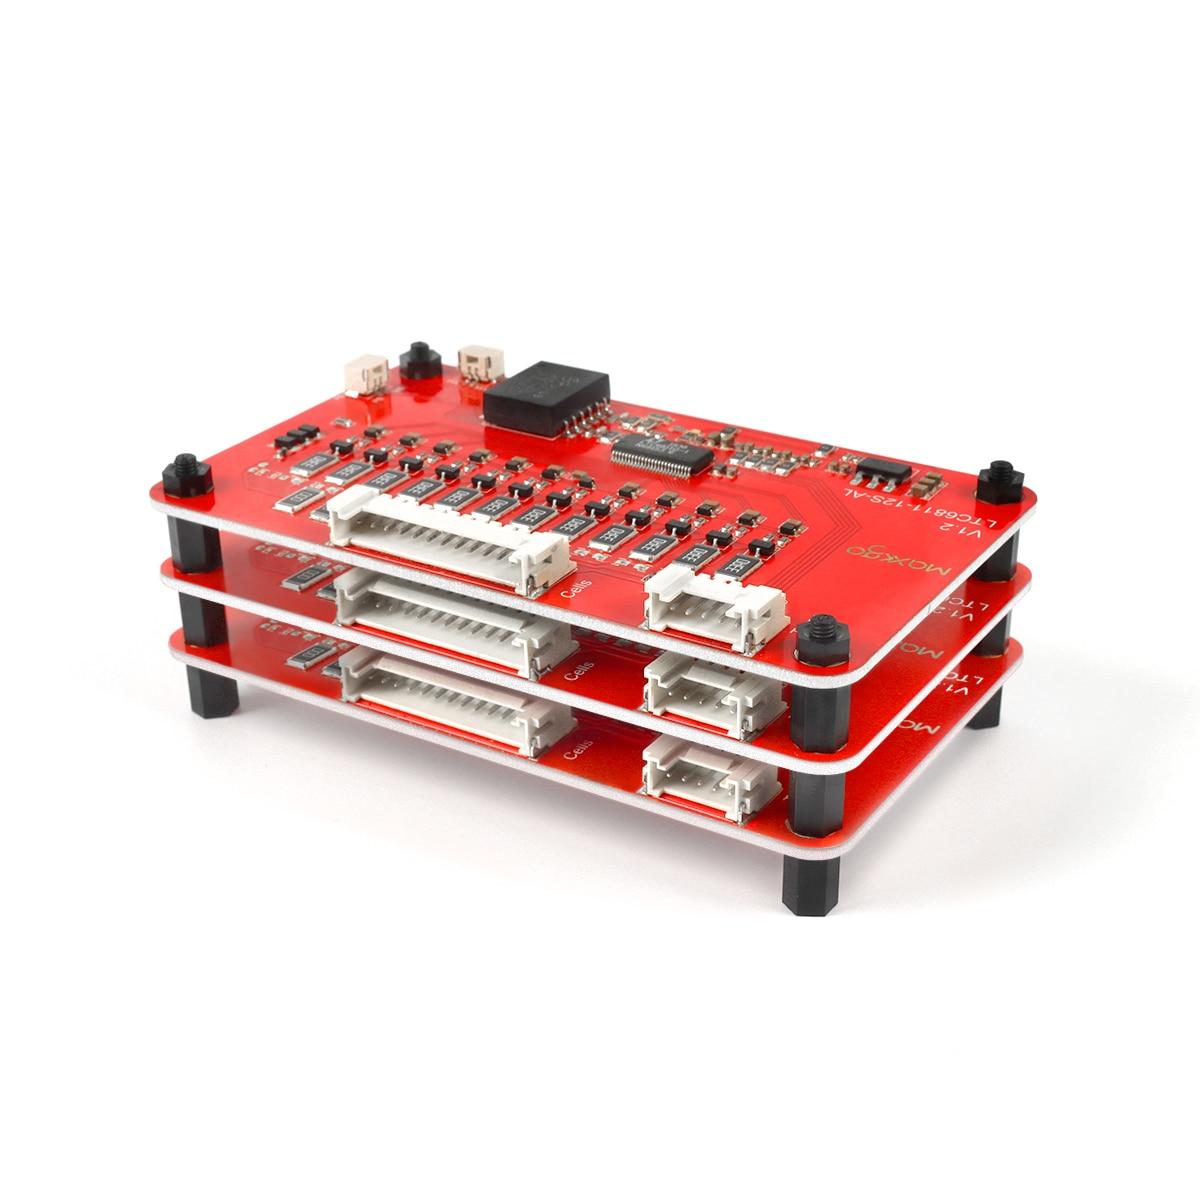 Battery Balance  BMS 8S 10S 12S Slave Board LTC6811 Aluminum Plate Li-ion Lithium 18650 Battery Management System